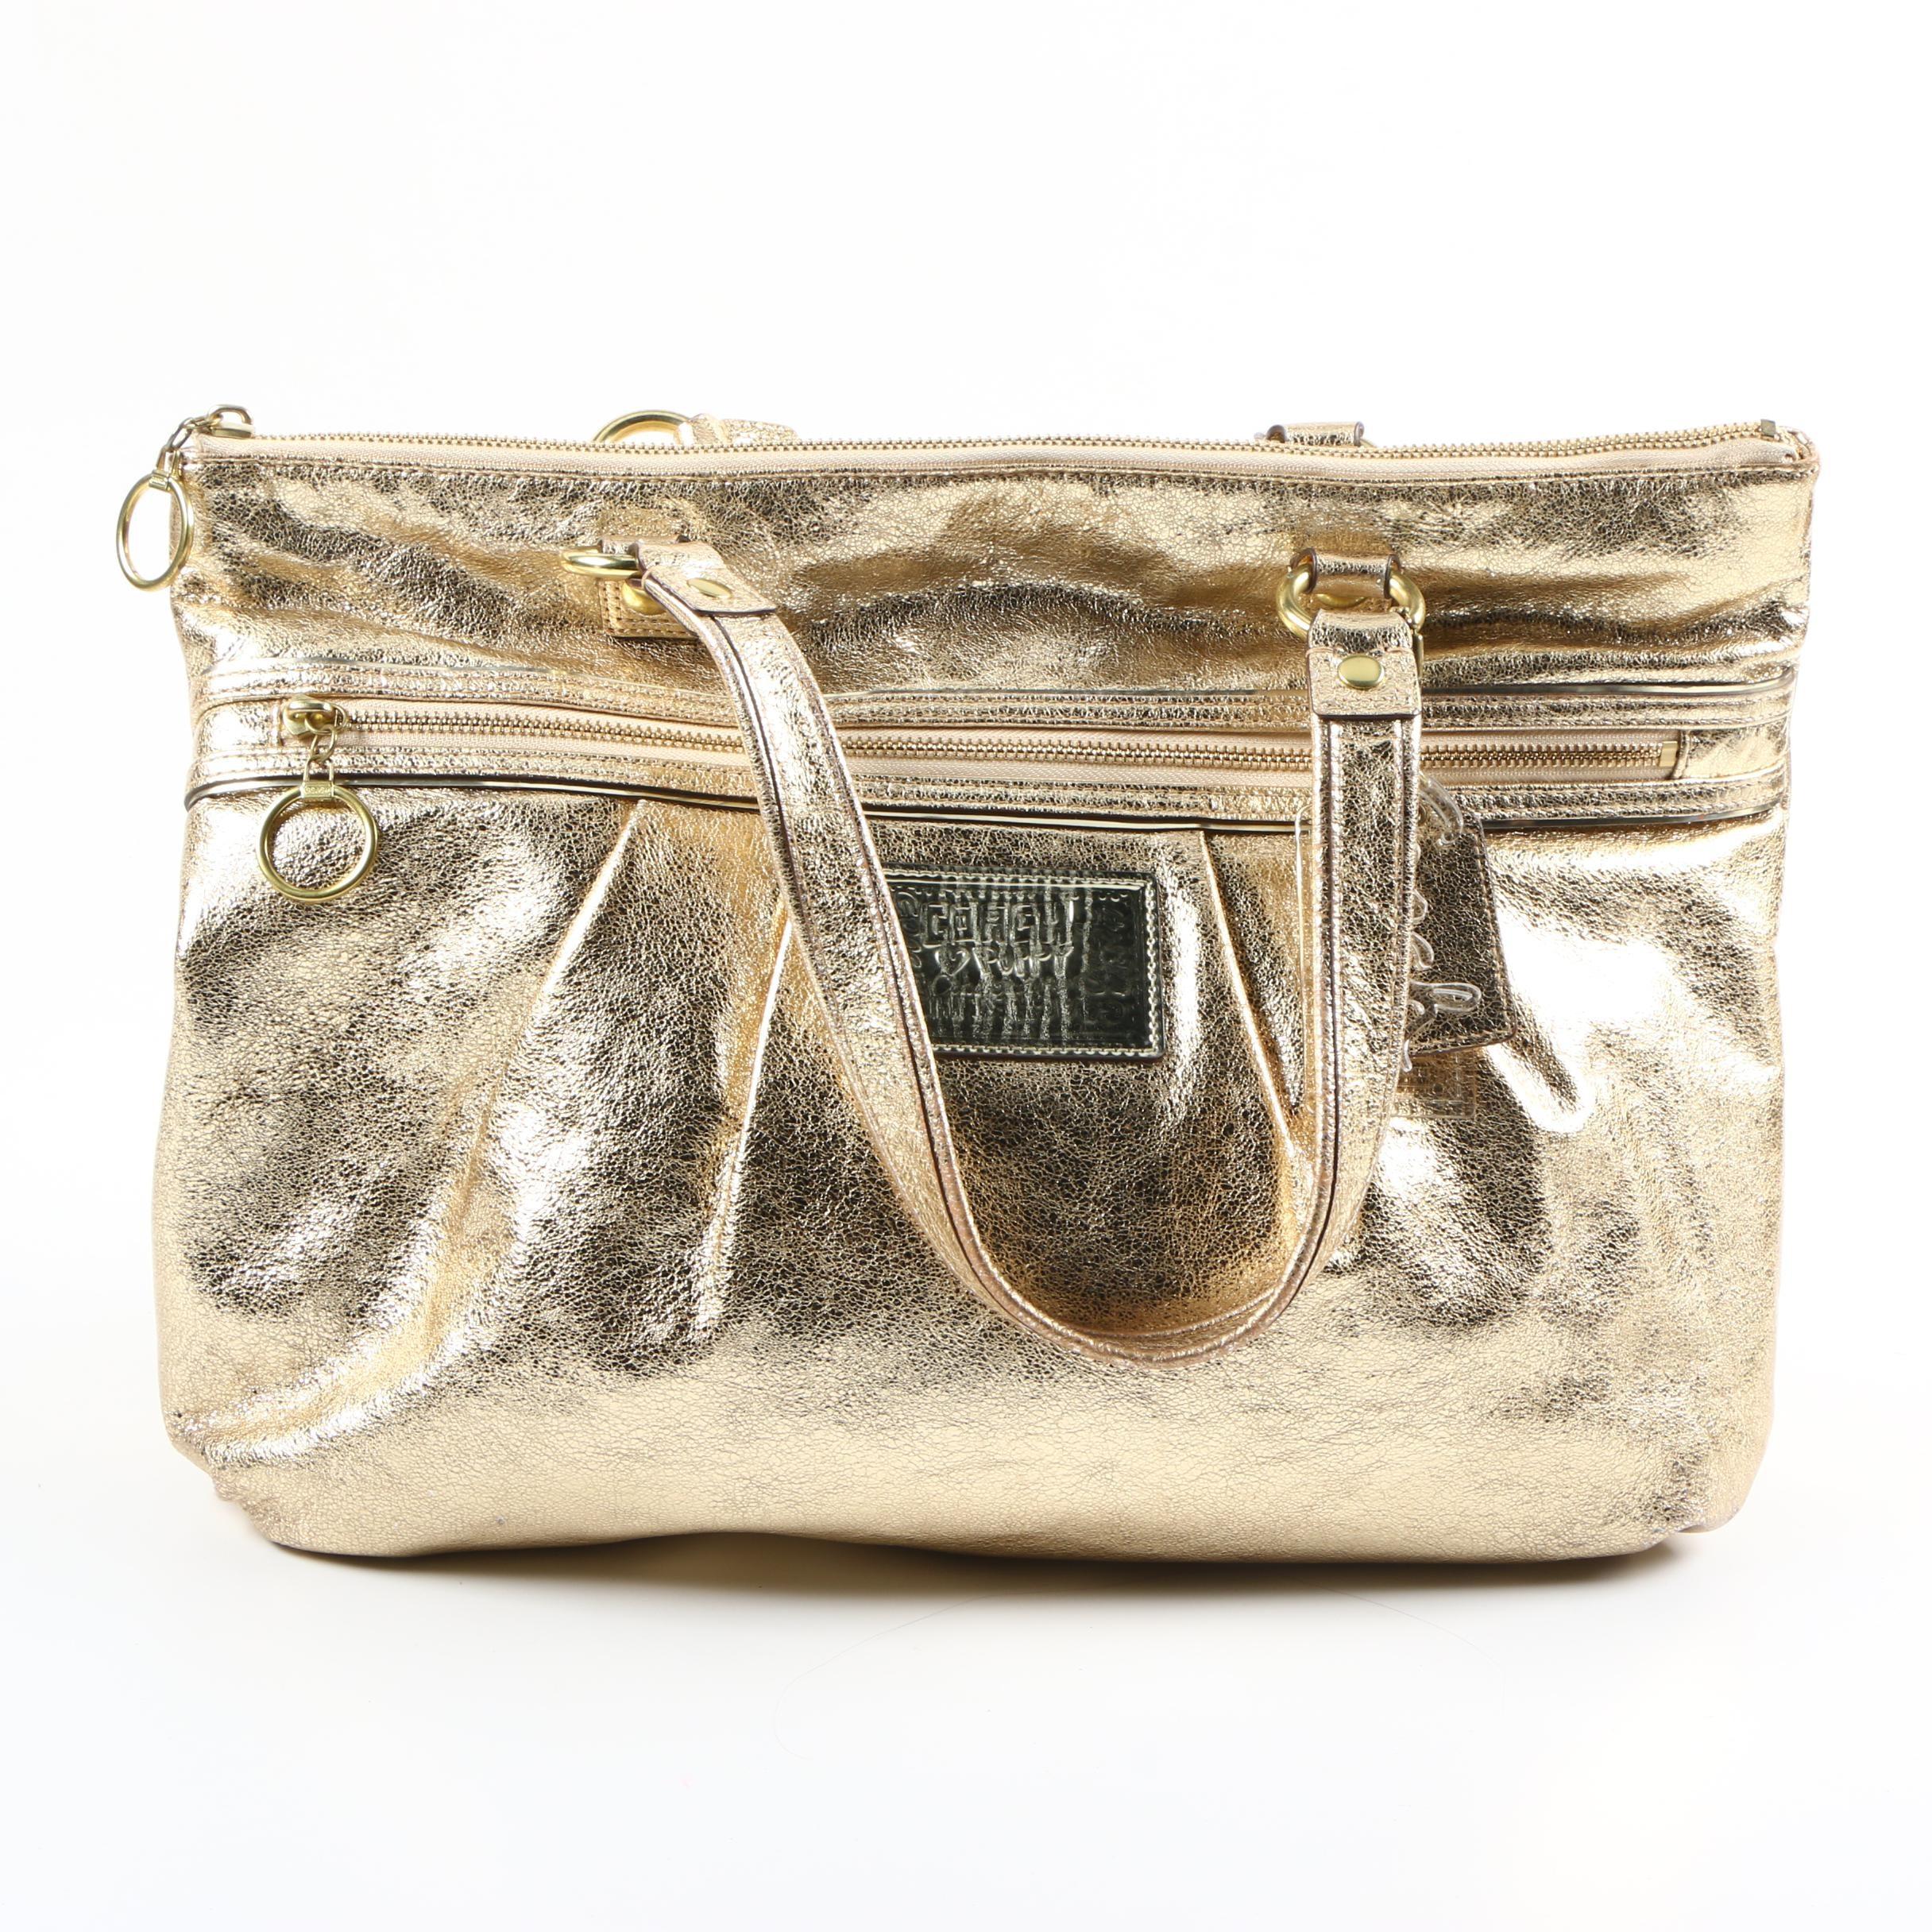 Coach Poppy Gold Metallic Tote Bag